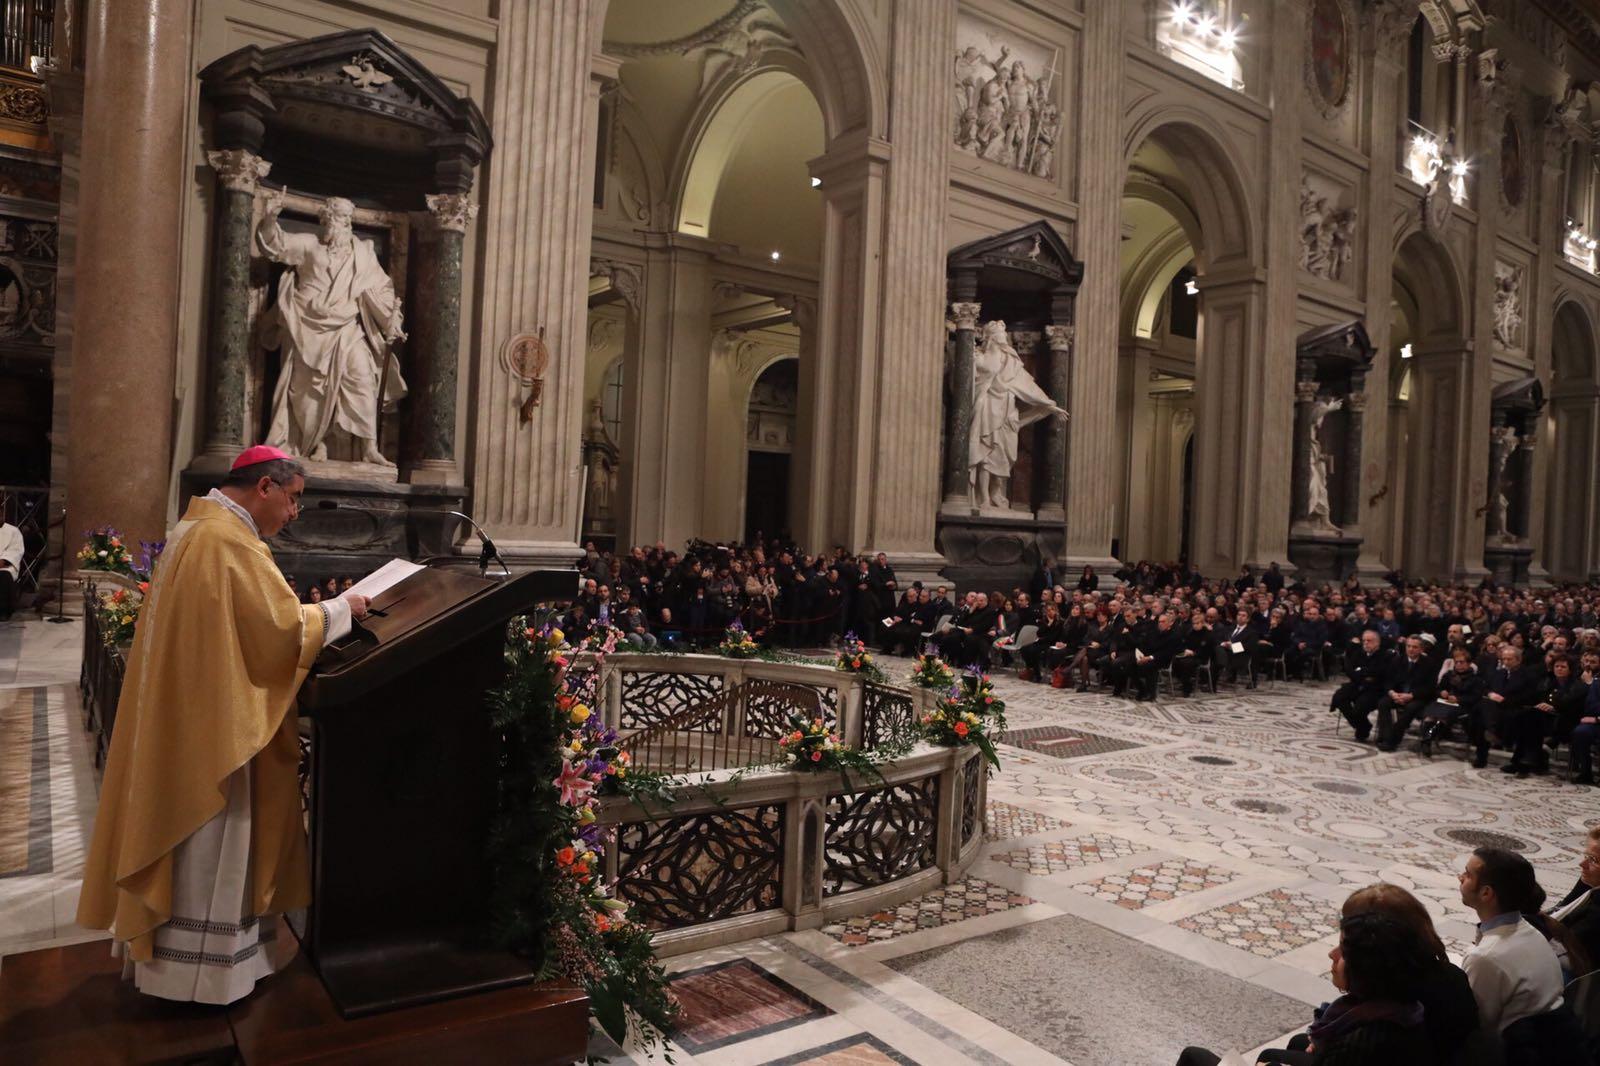 Mgr Becciu au Latrn, courtoisie de Sant'Egidio